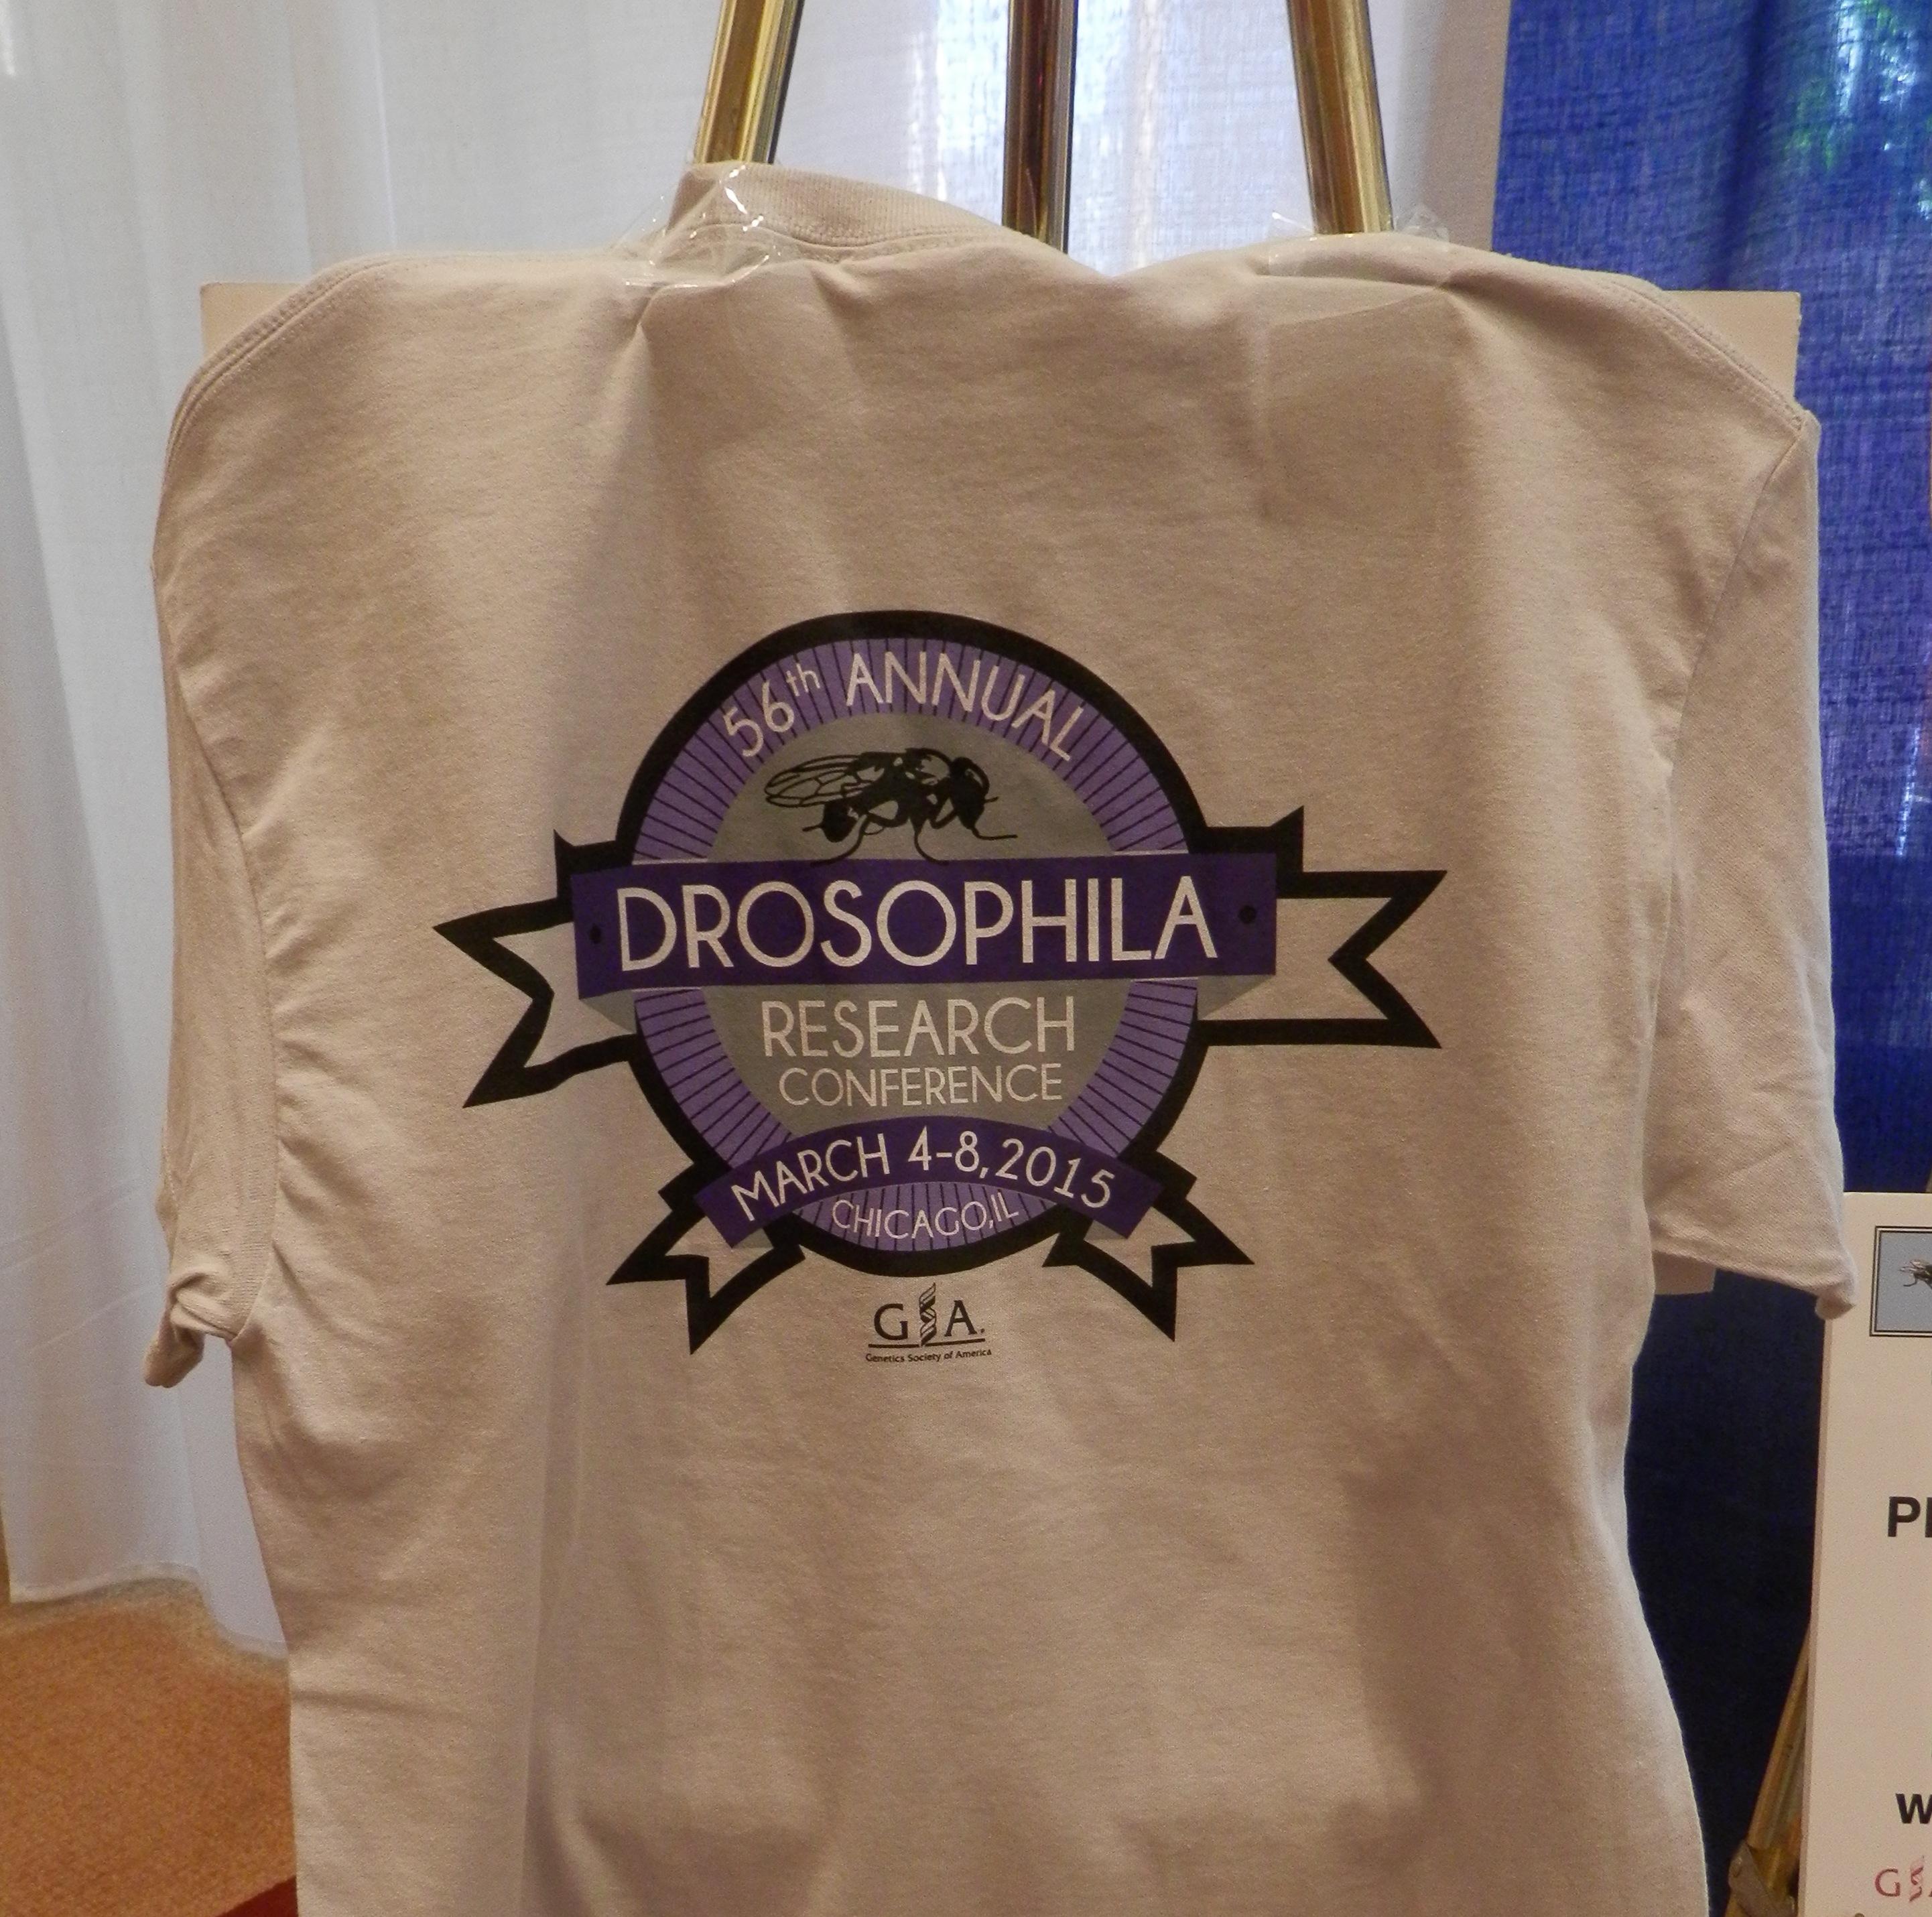 drosophila t-shirt